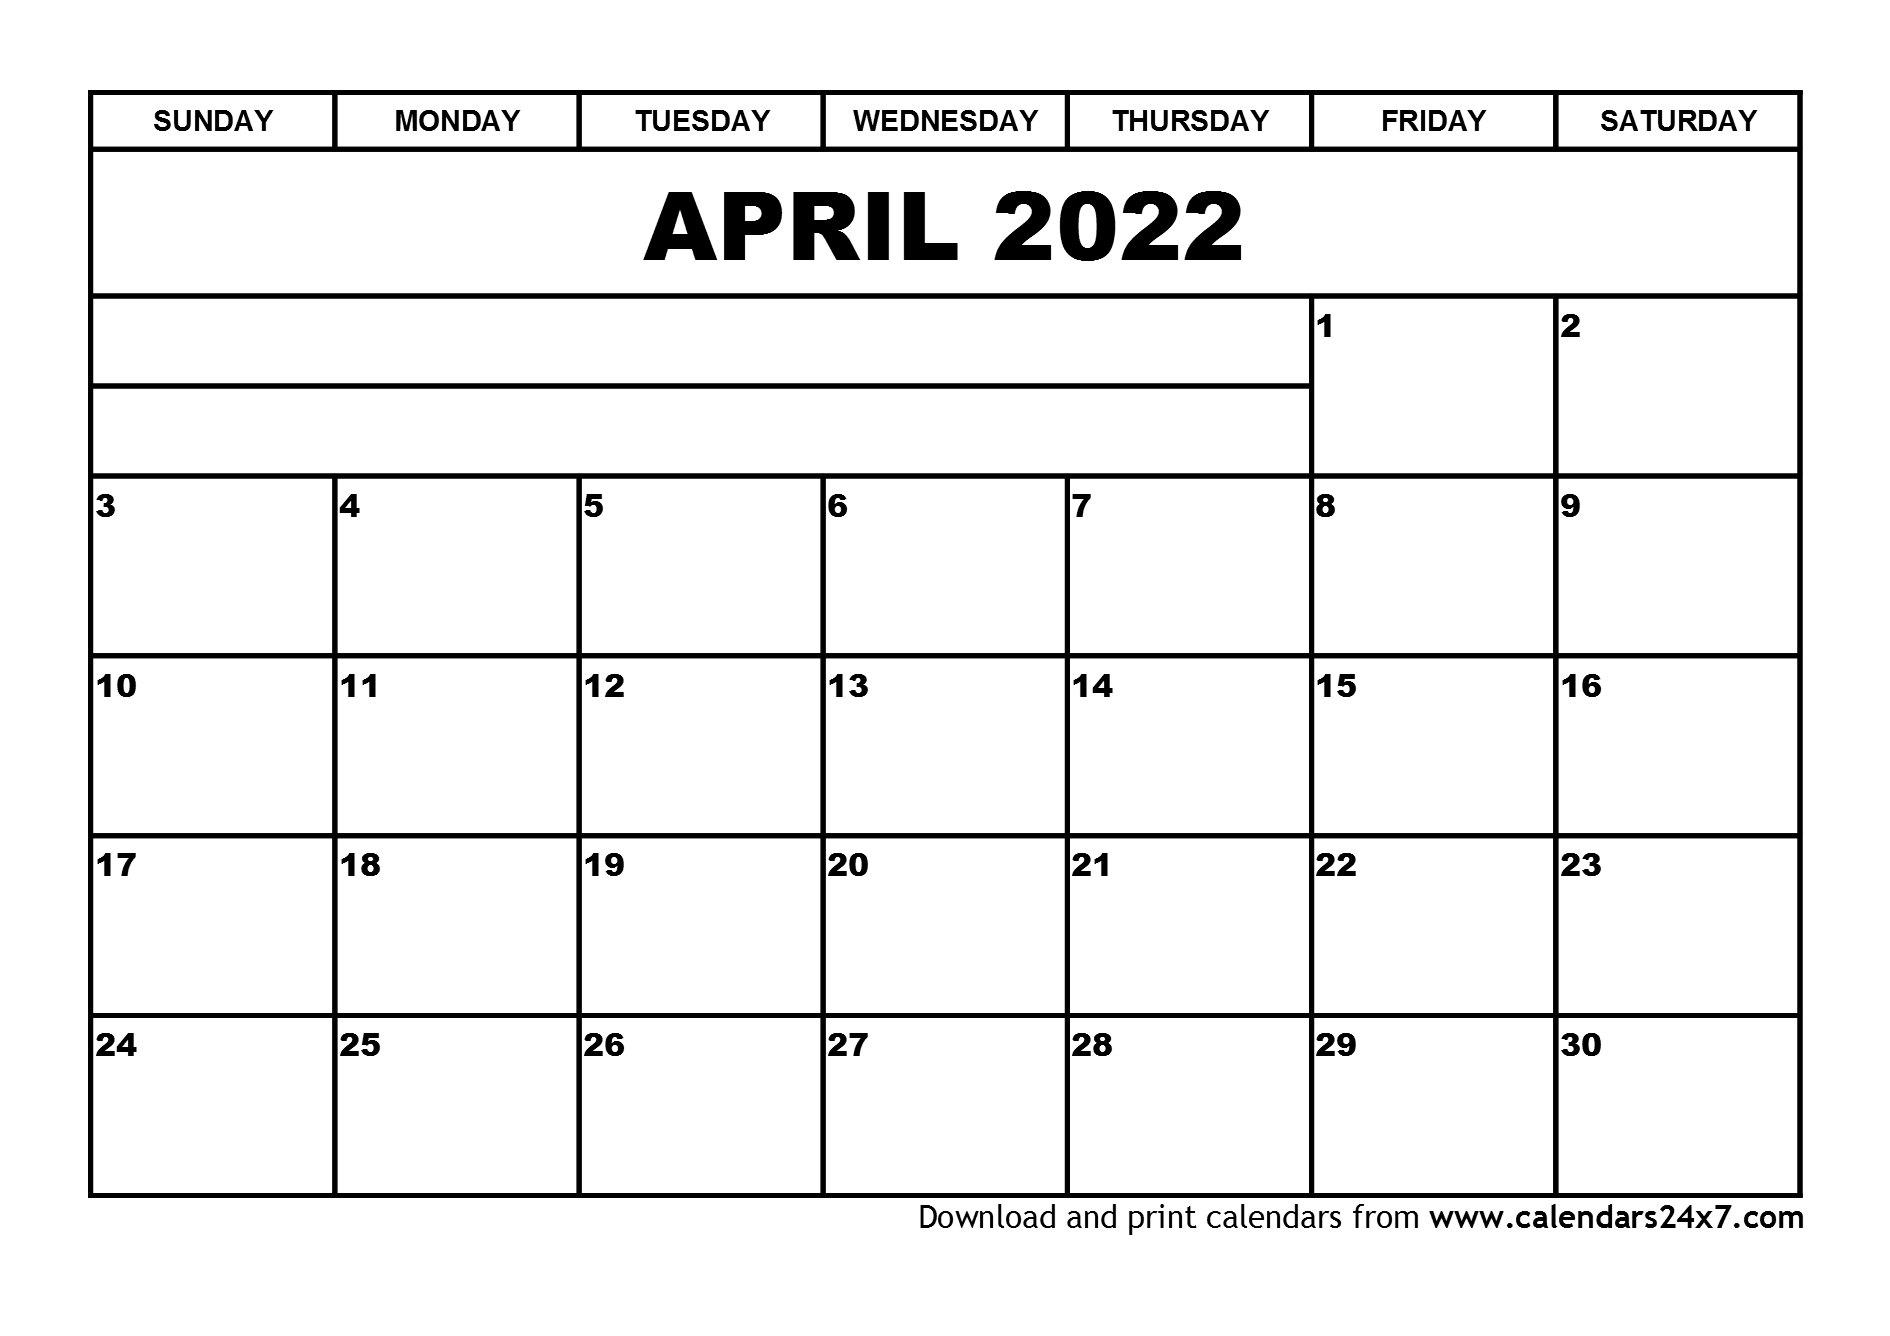 April 2022 Calendar & May 2022 Calendar